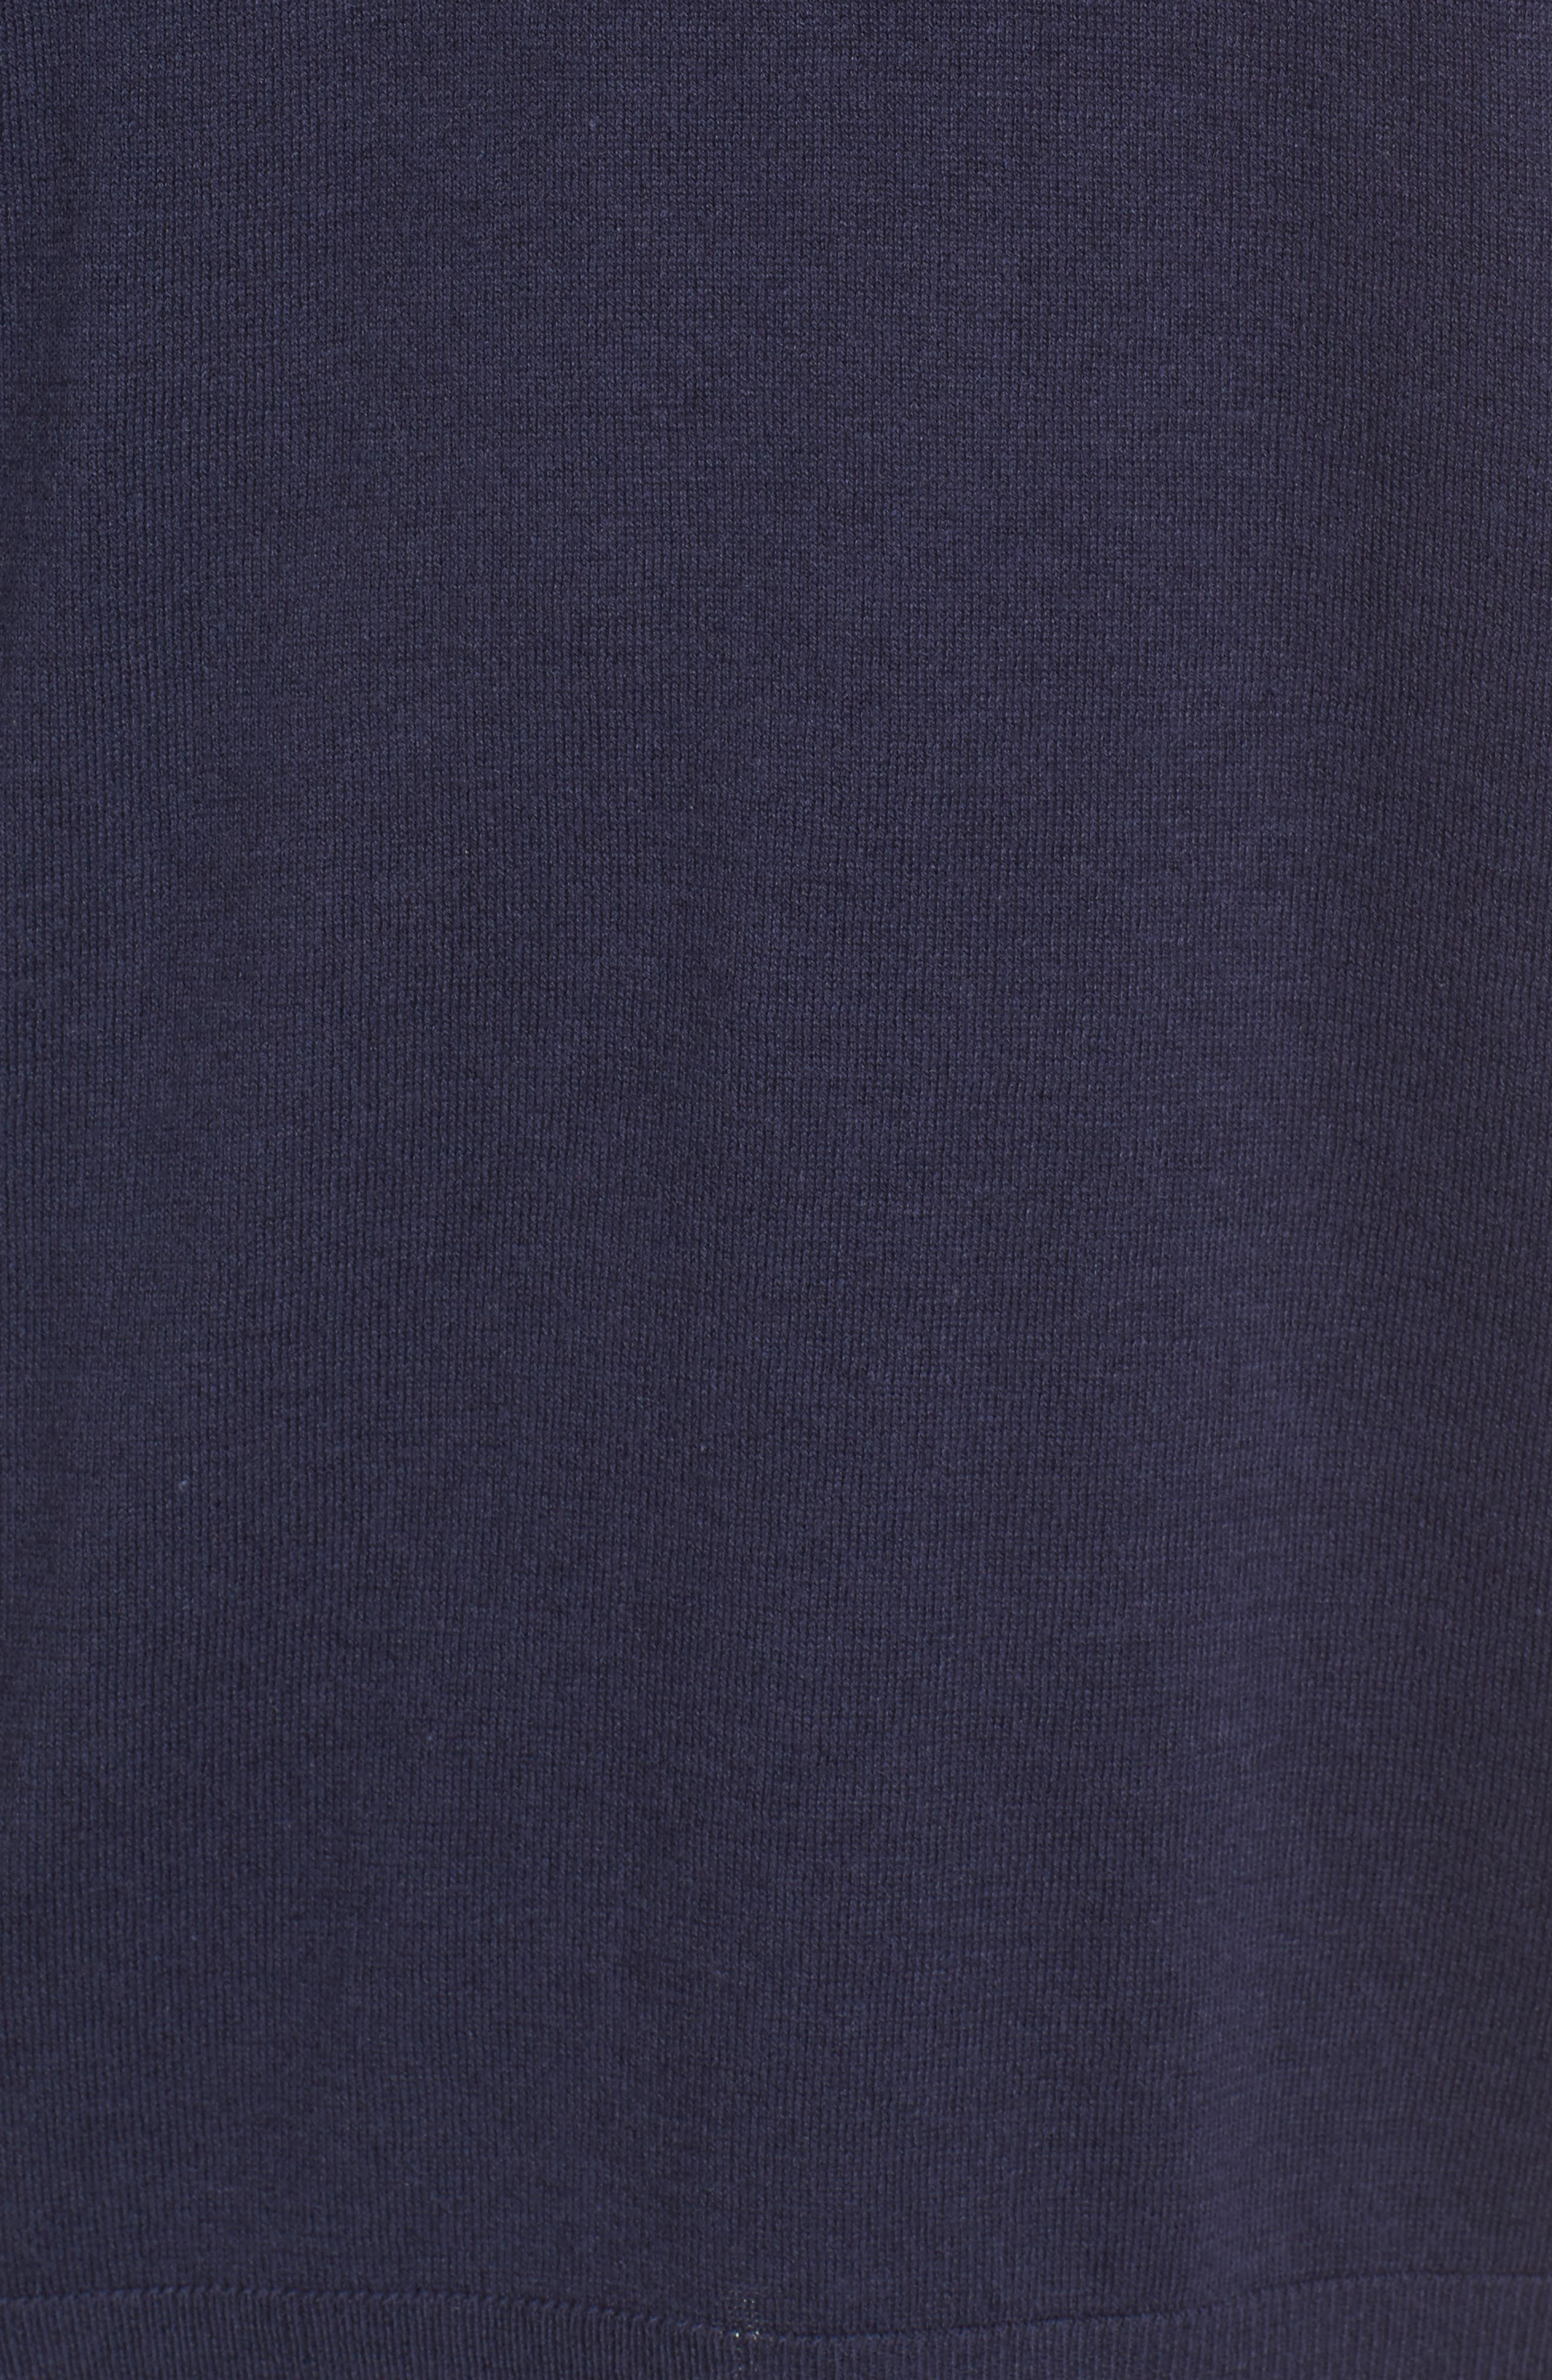 Poplin Bow Detail Sweater,                             Alternate thumbnail 10, color,